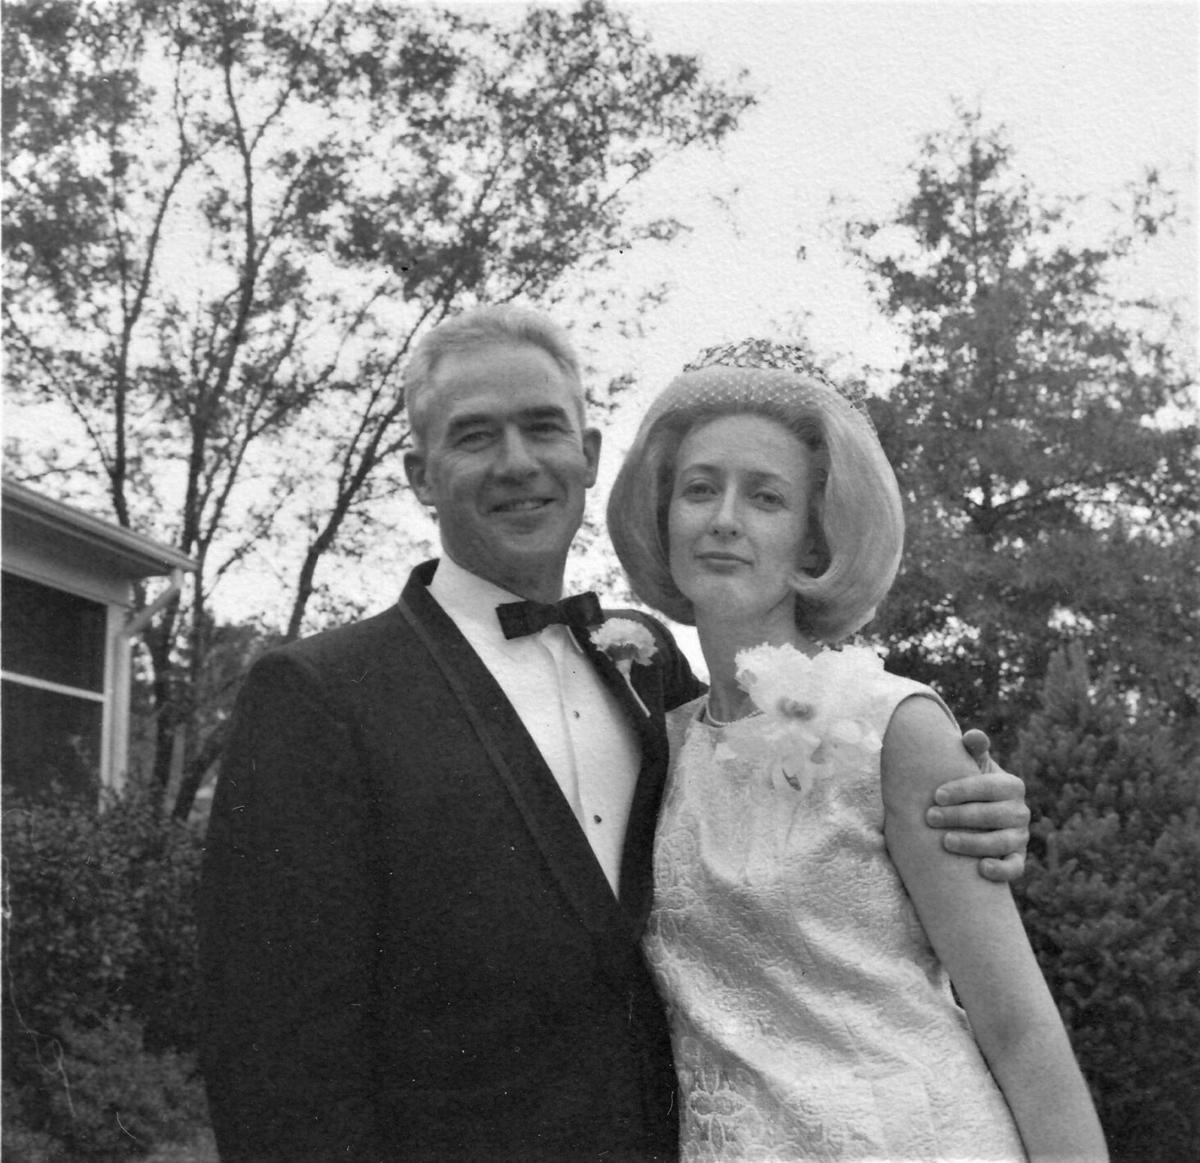 Pat and Jean Fallon